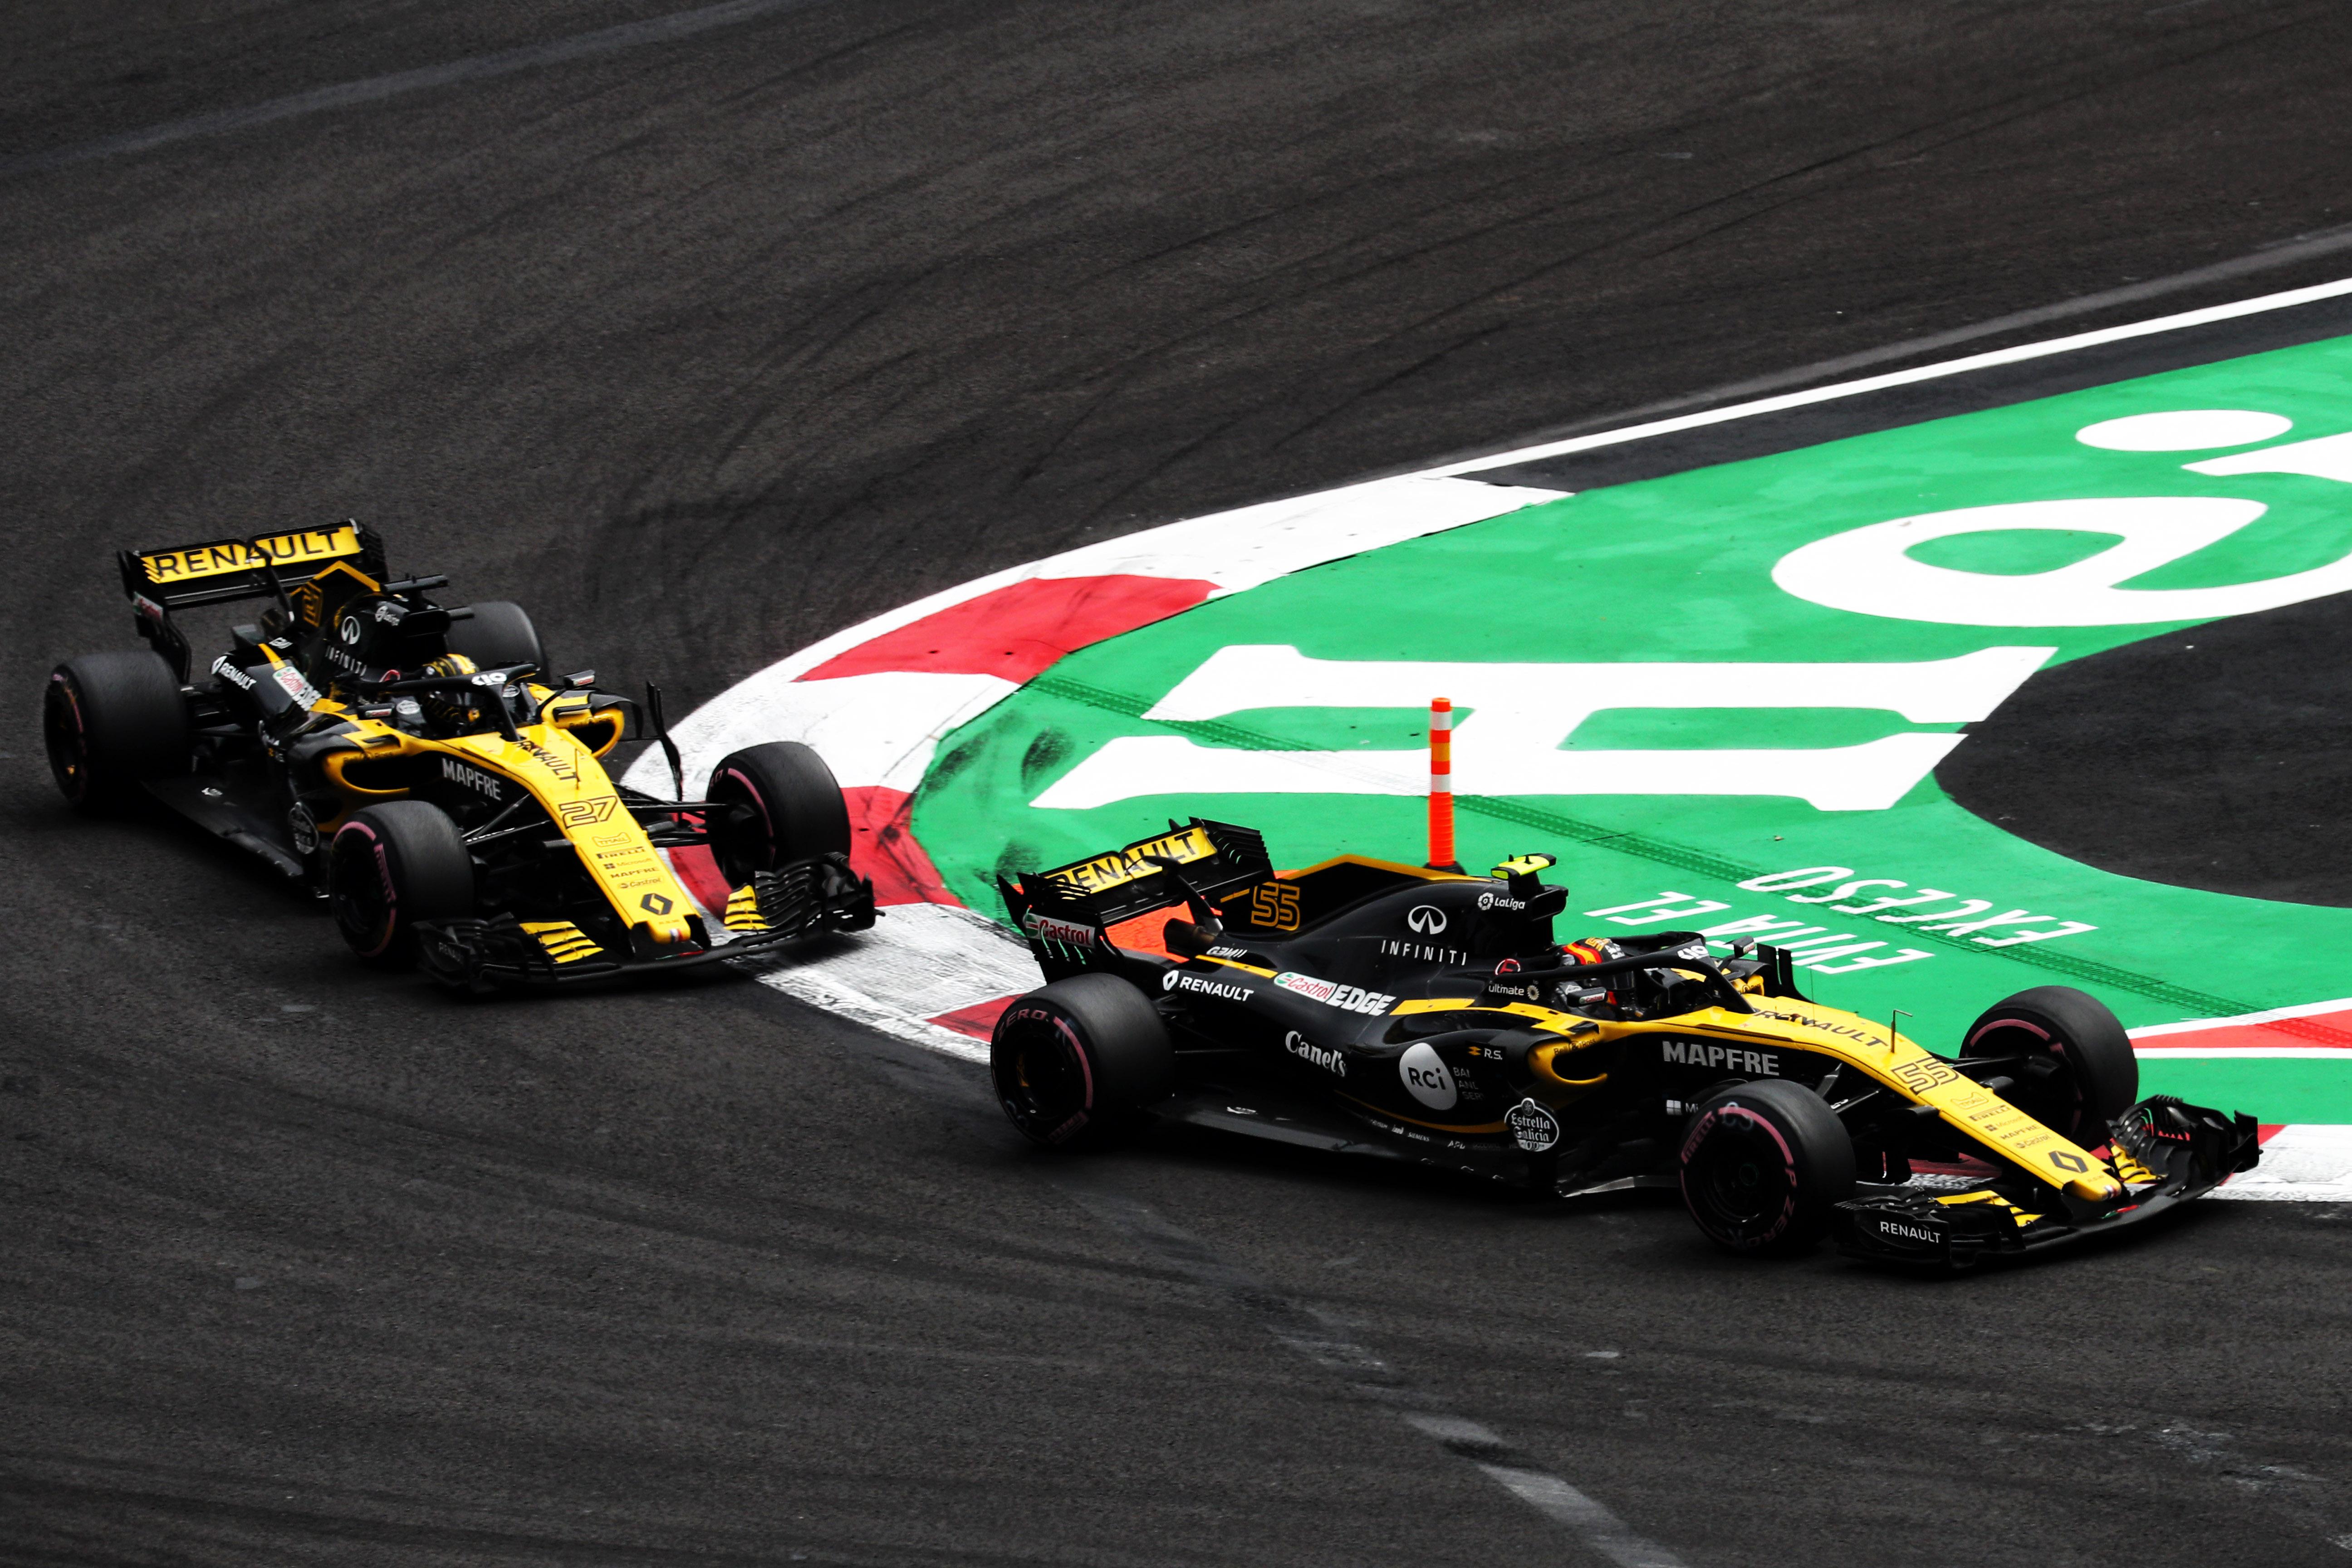 Nico Hulkenberg Carlos Sainz Jr Renault Mexican Grand Prix 2018